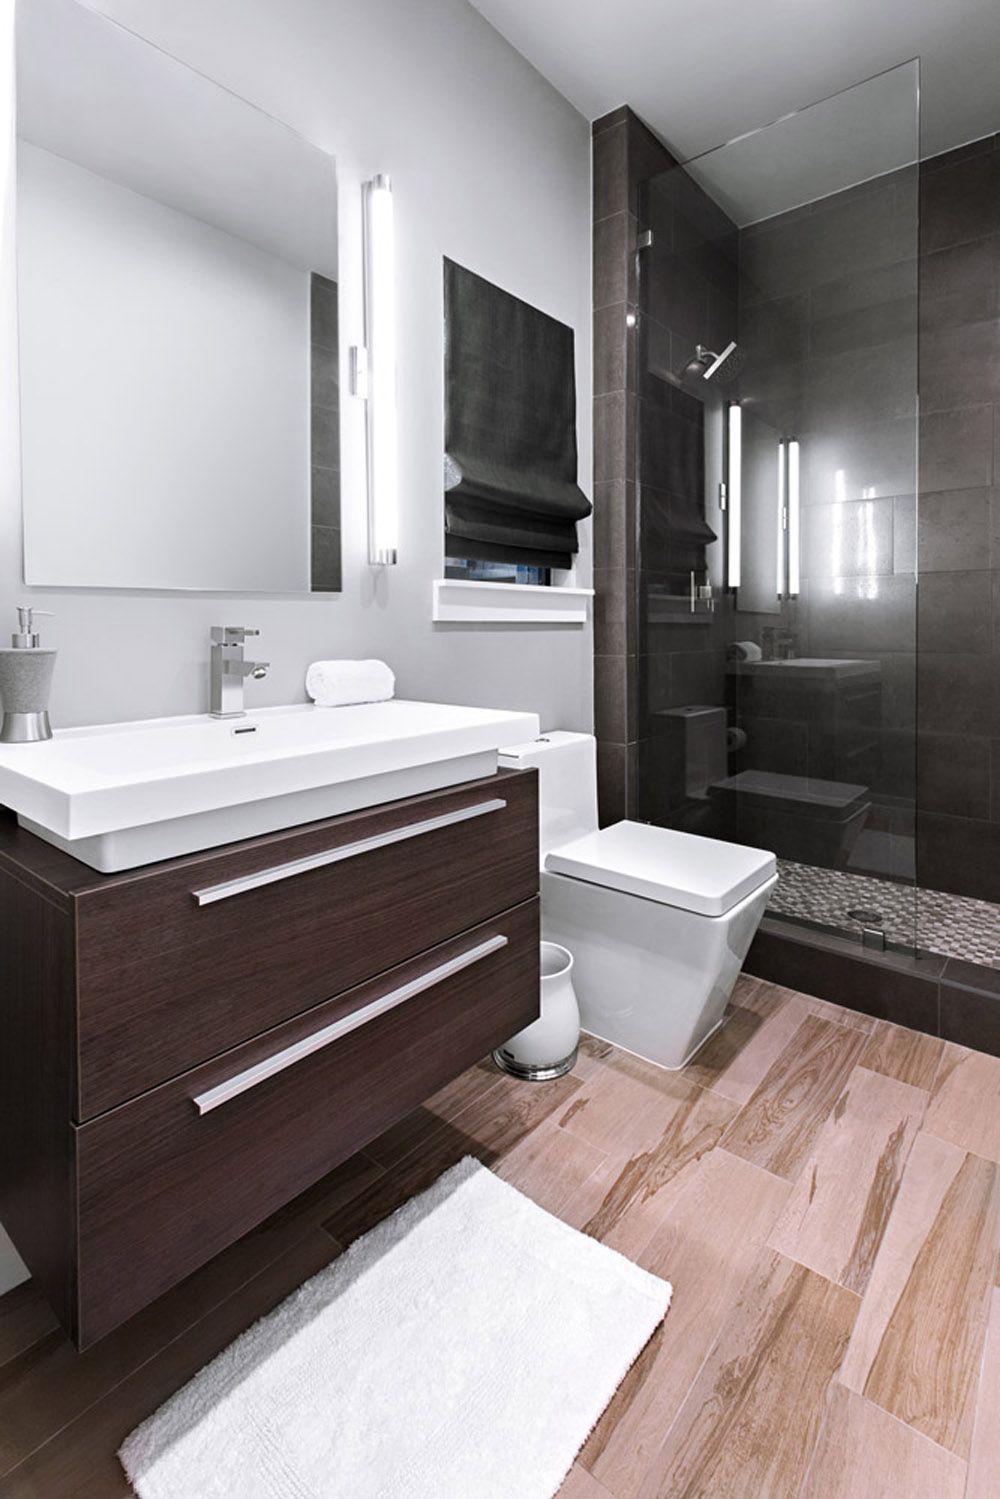 Bathroom Design Houston contour interior design – houston, texas | modern guest house